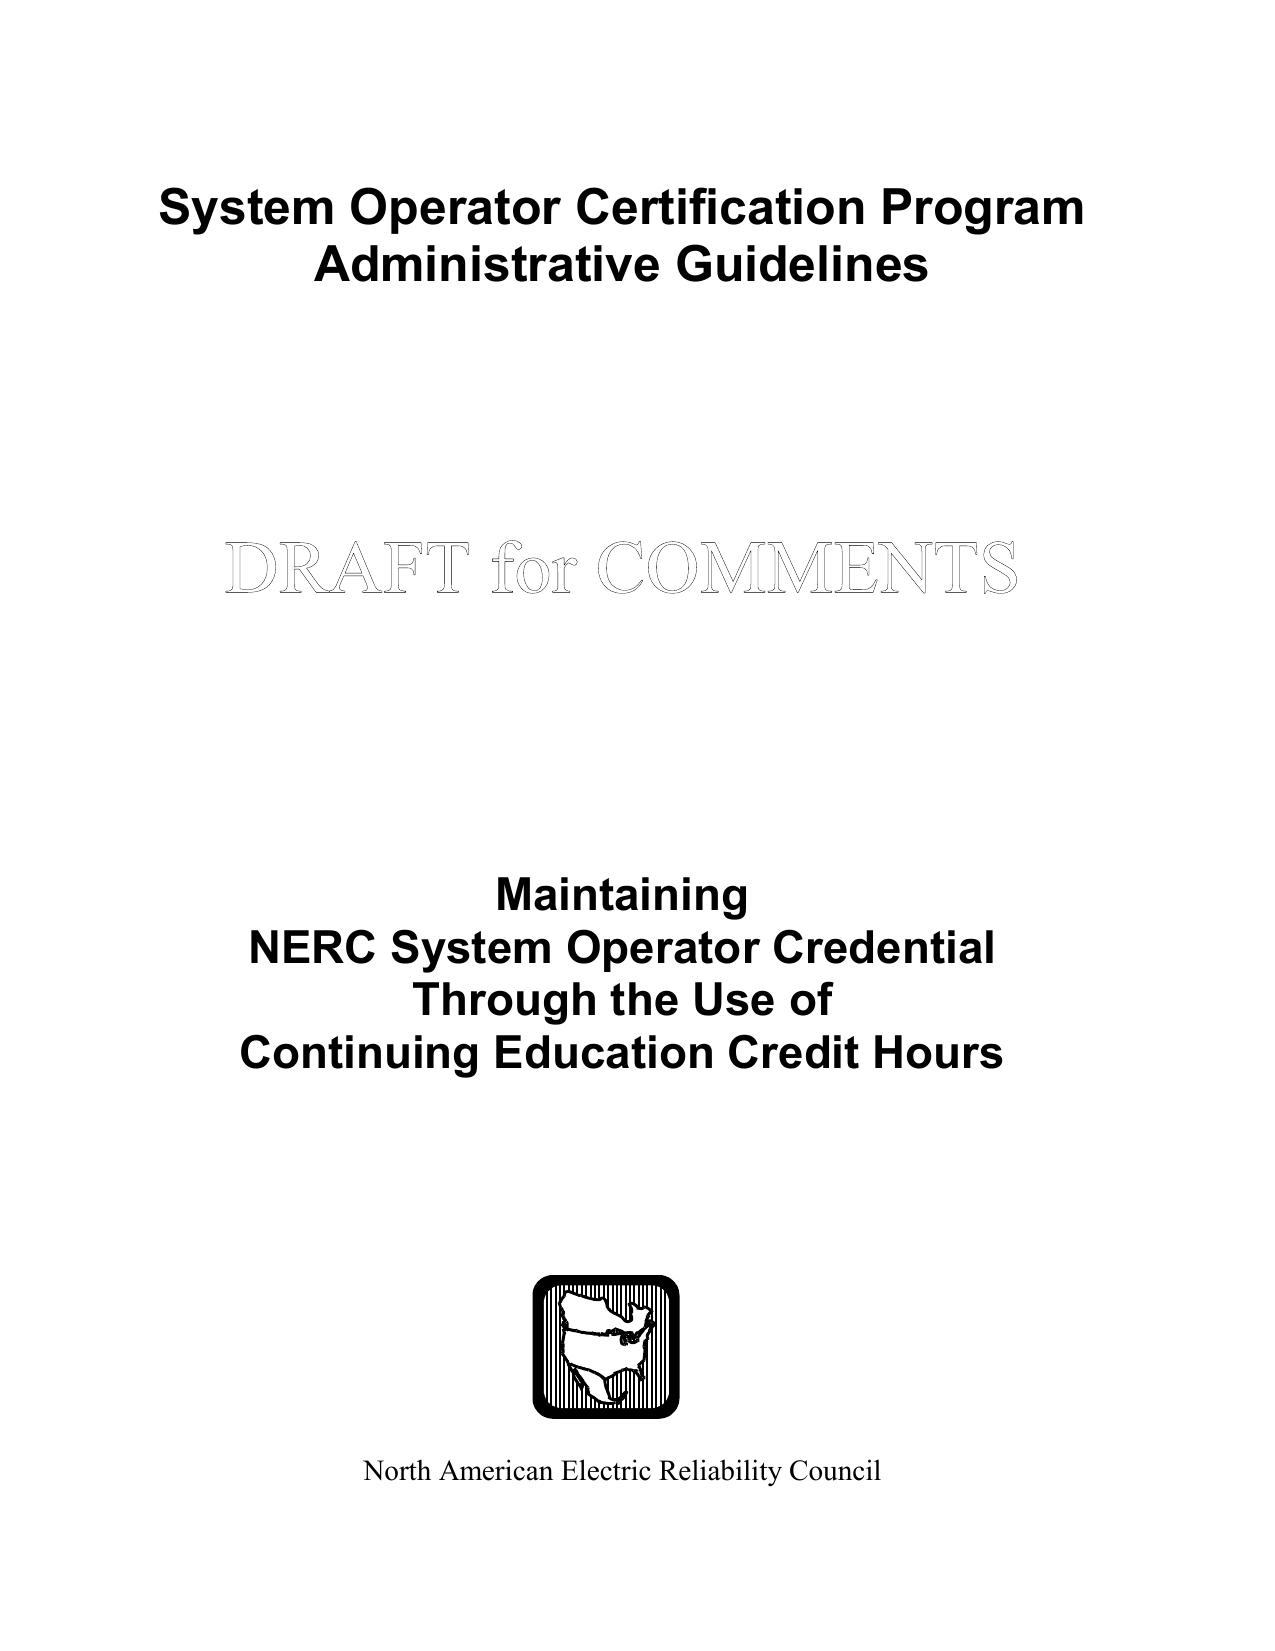 System Operator Certification Program Administrative